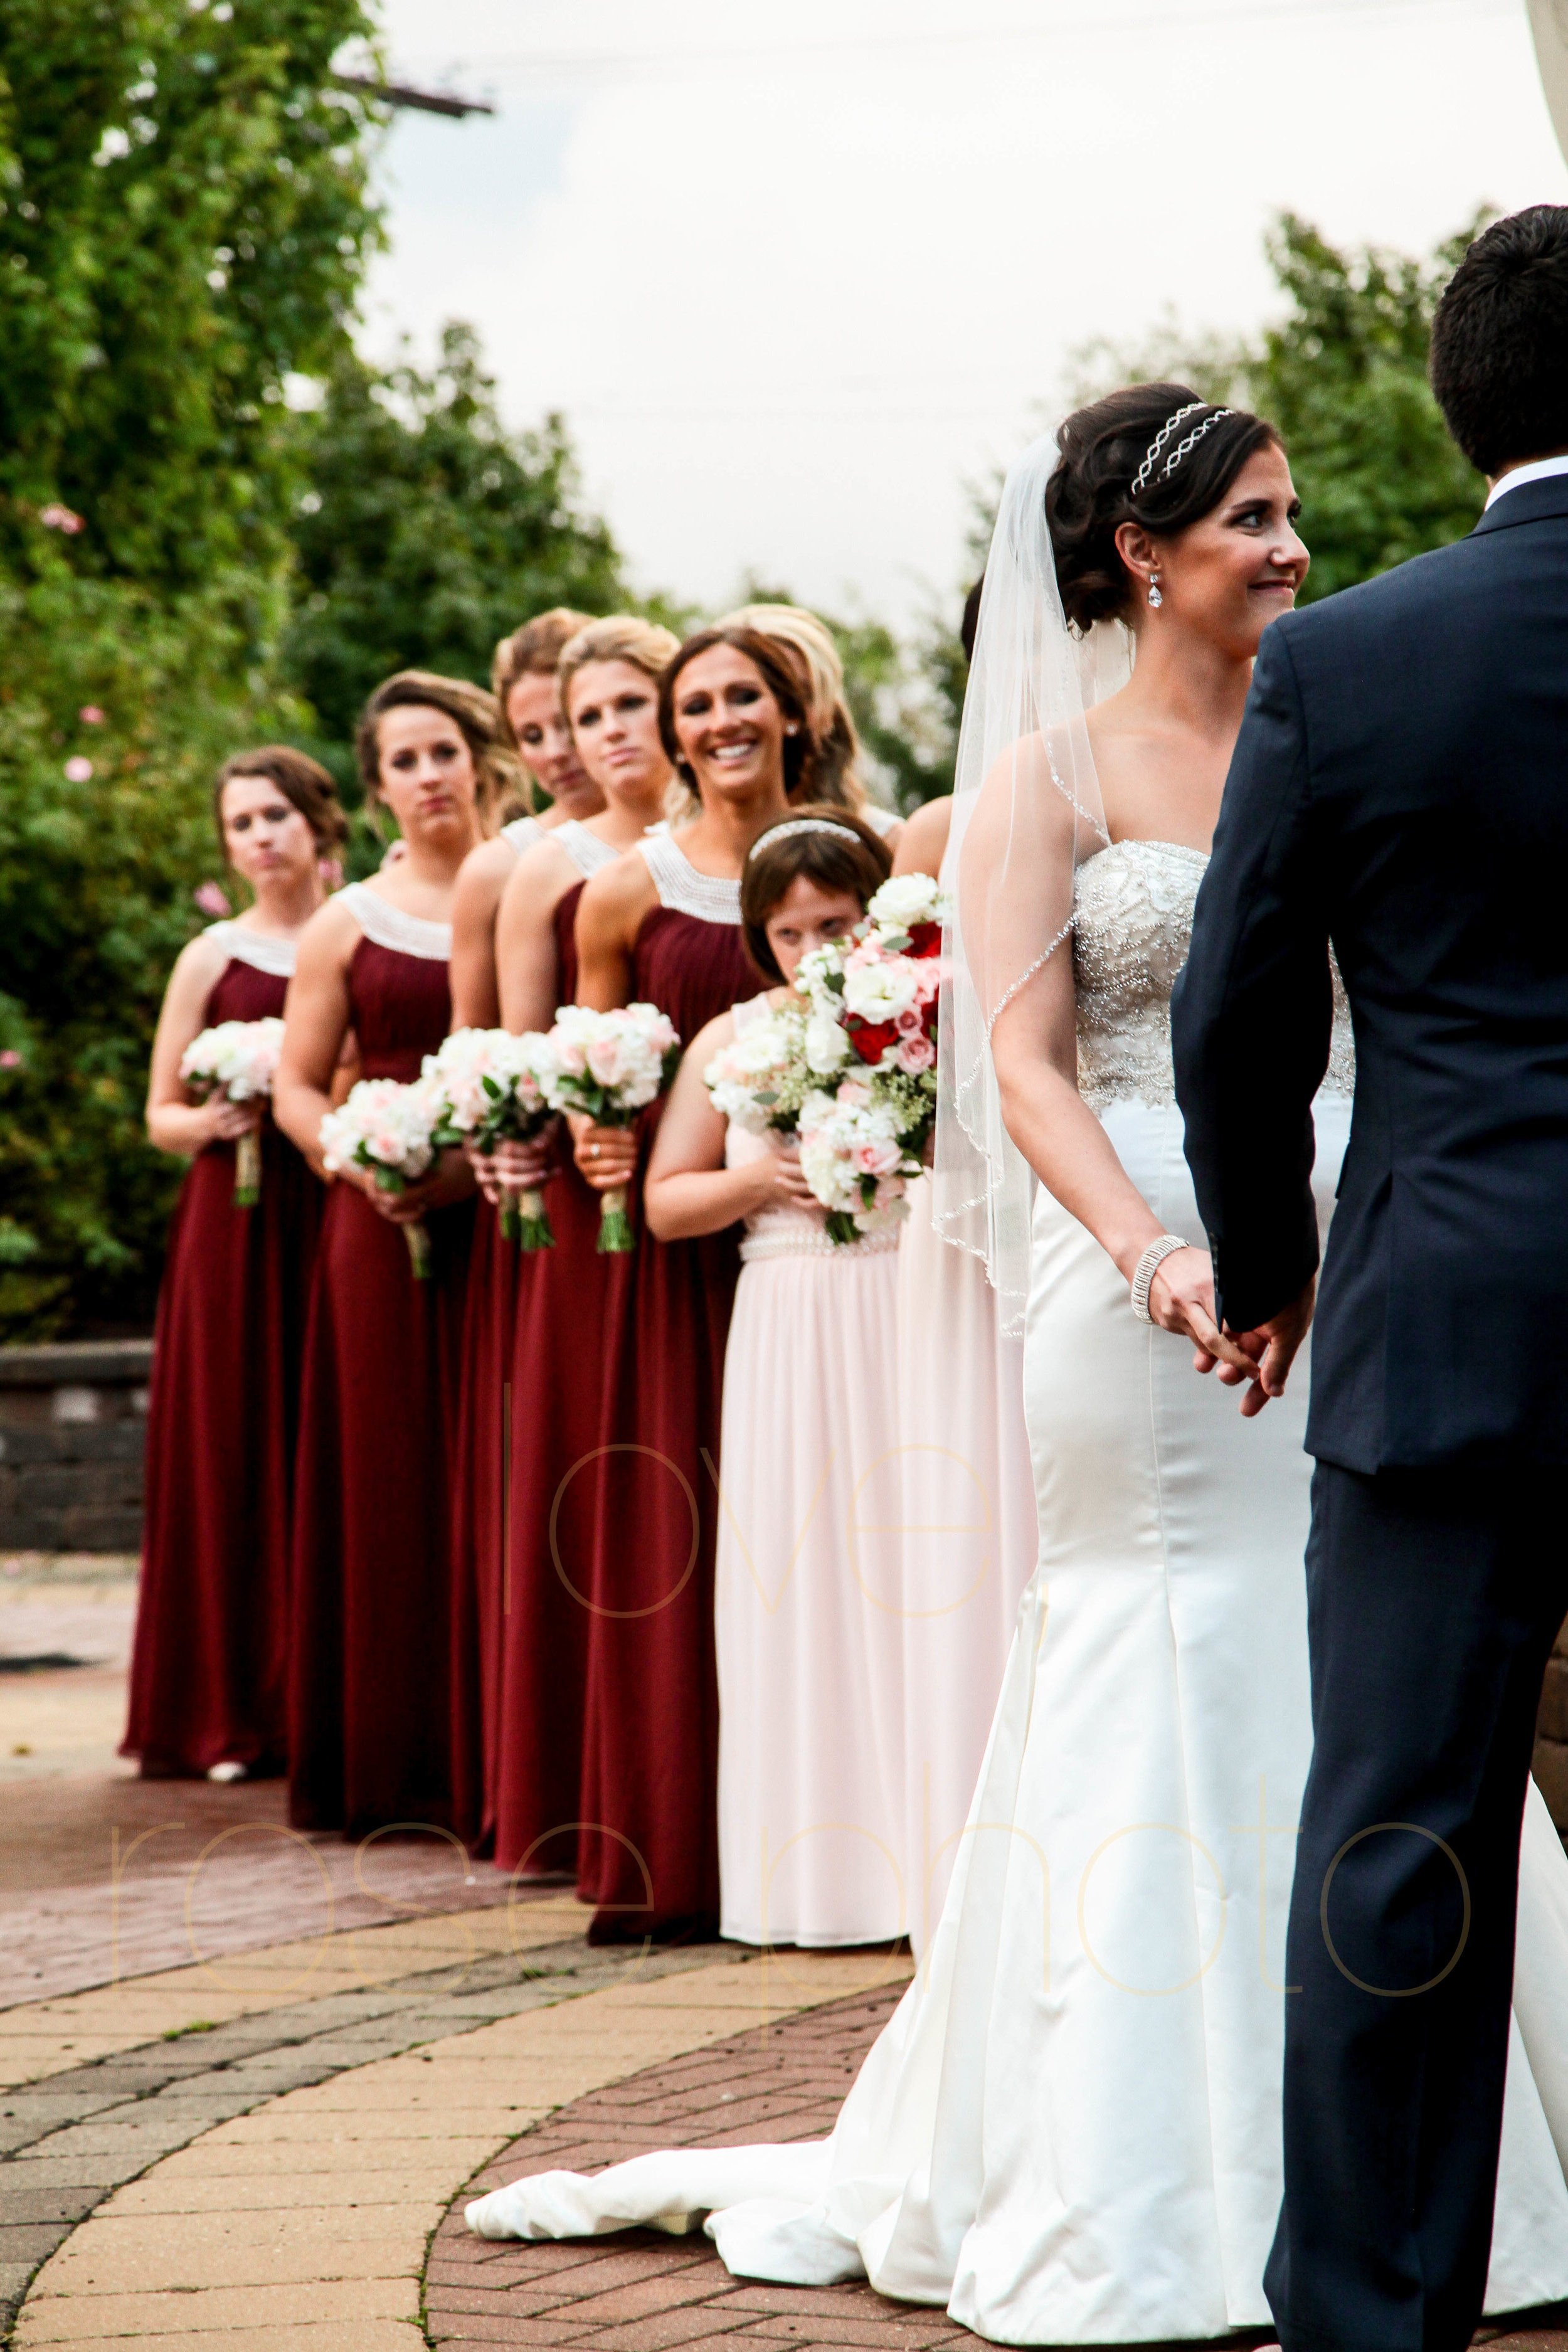 Alison + Mike Chicago Wedding Photographer Blog -30.jpg